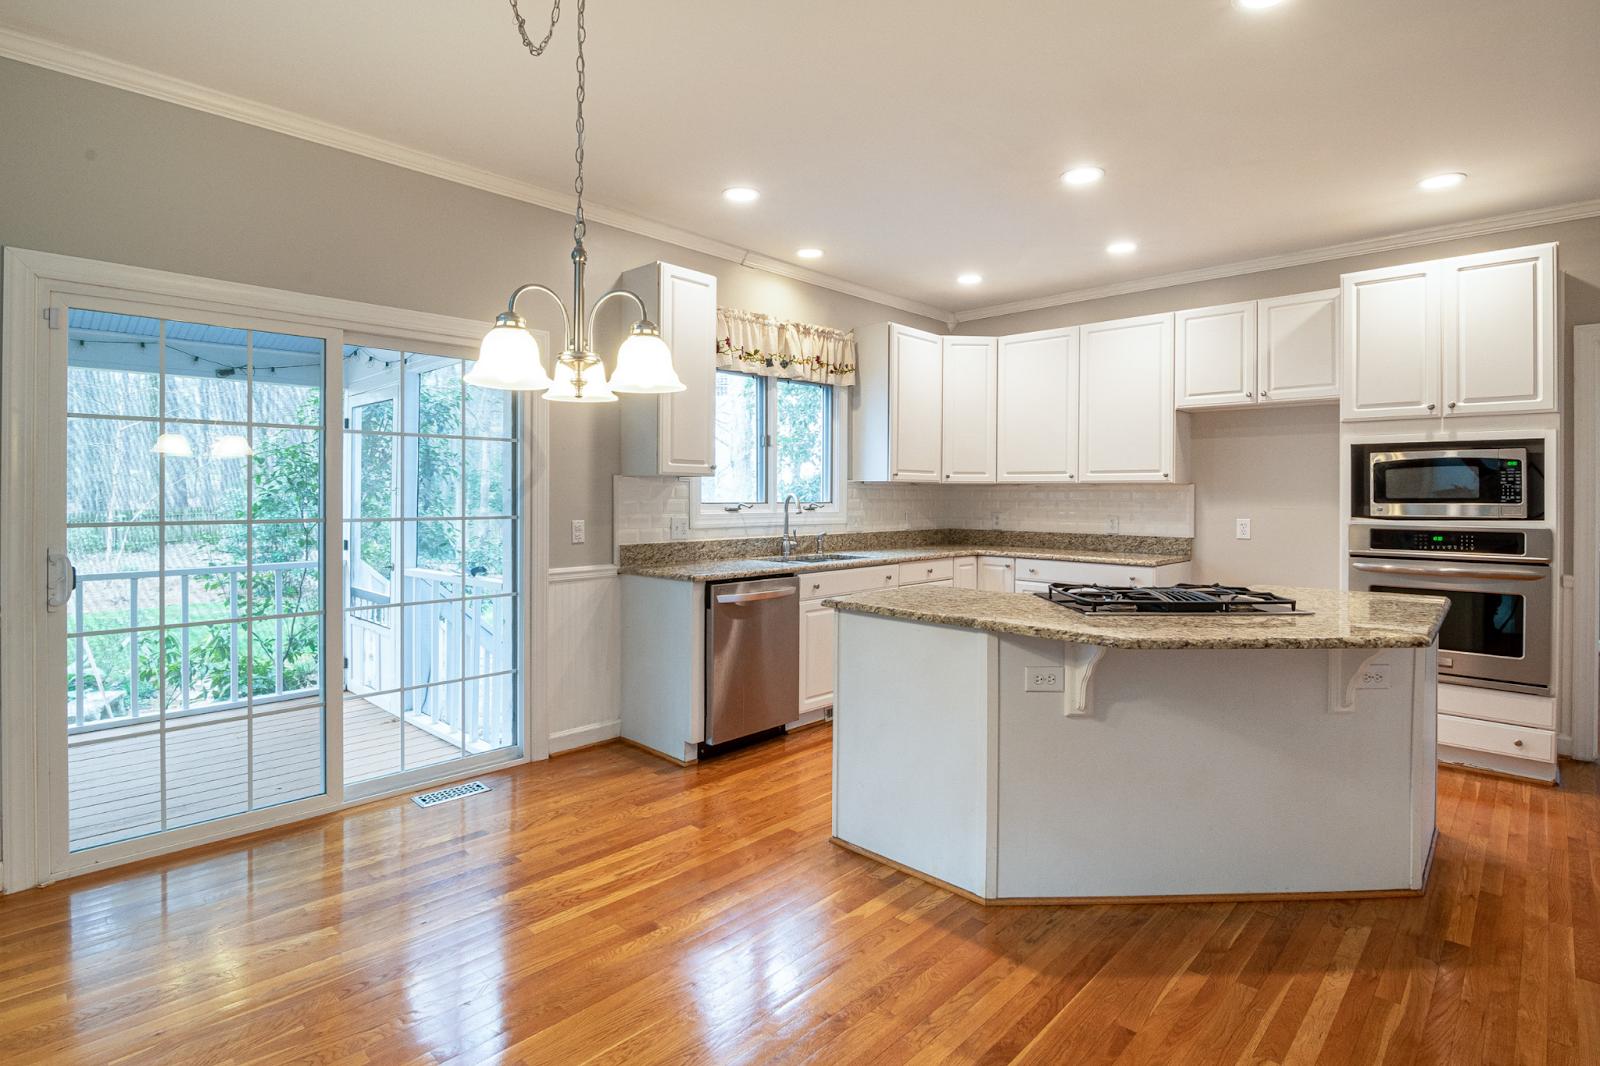 Kitchen with Sliding Glass Door